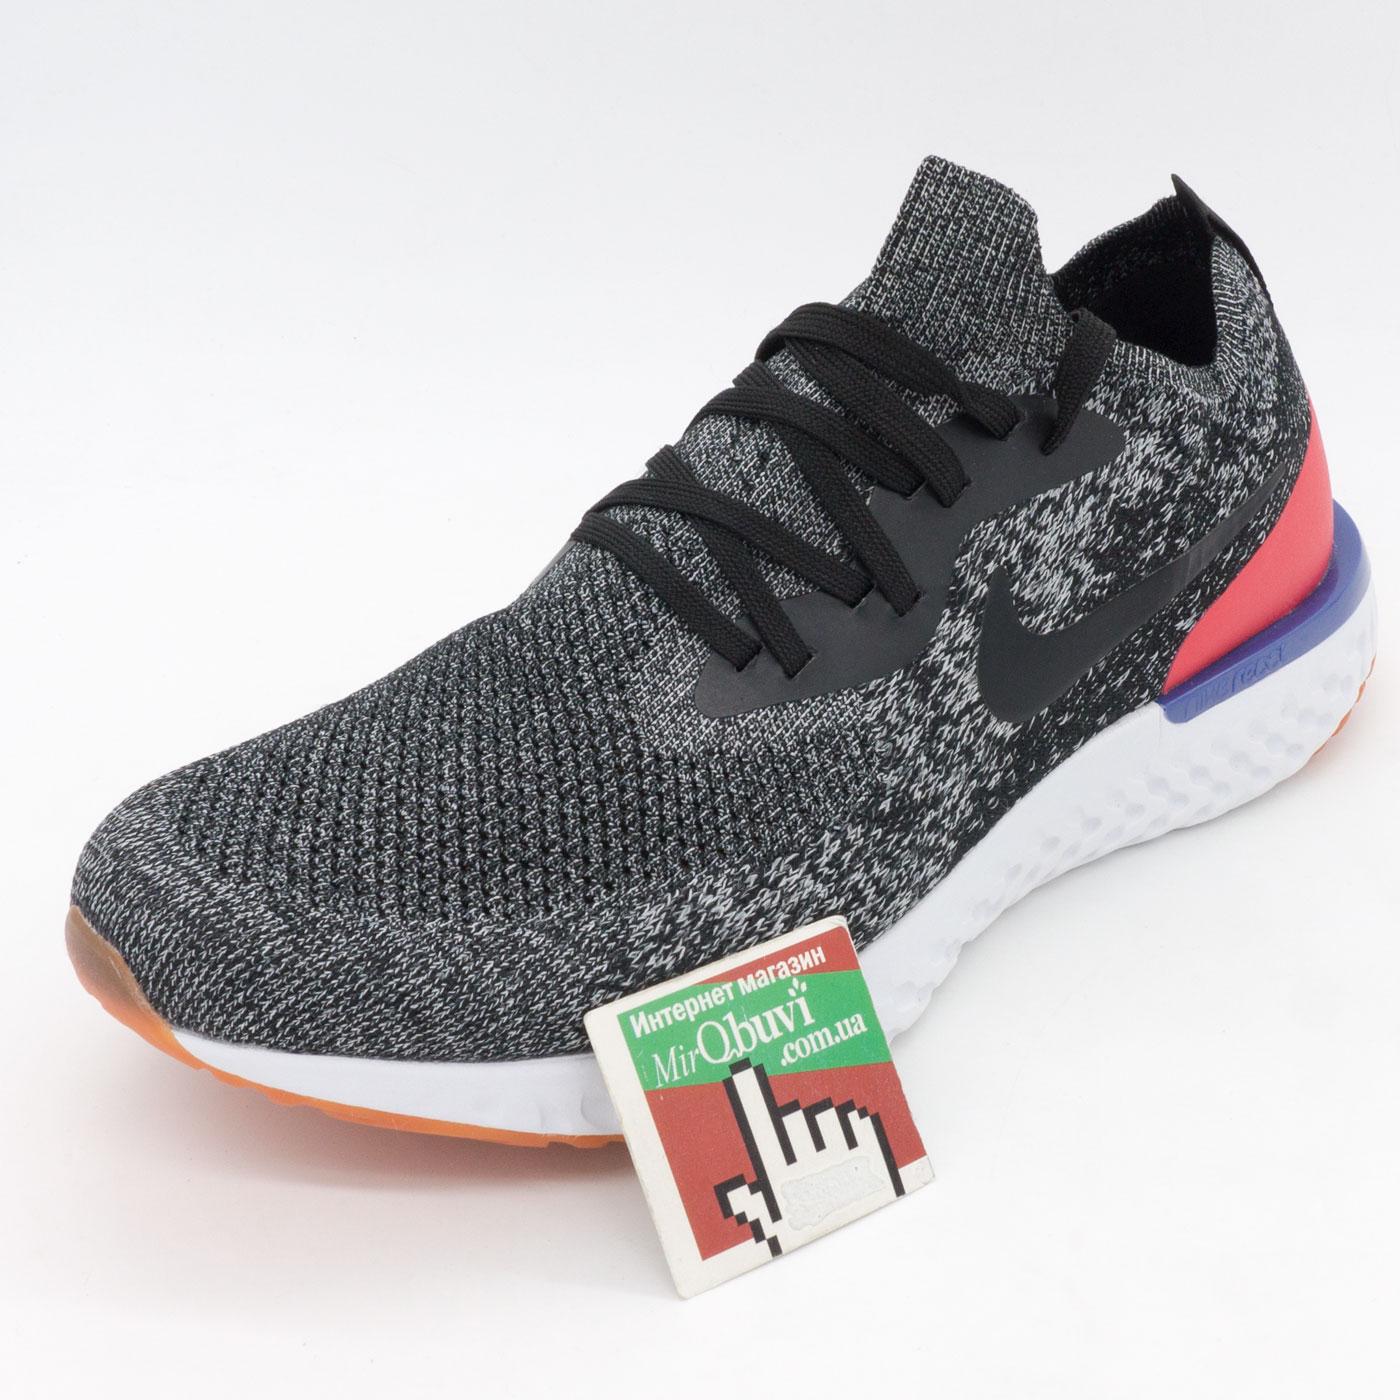 фото front Мужские кроссовки для бега Nike Epic React Flyknit зебра. Топ качество! front